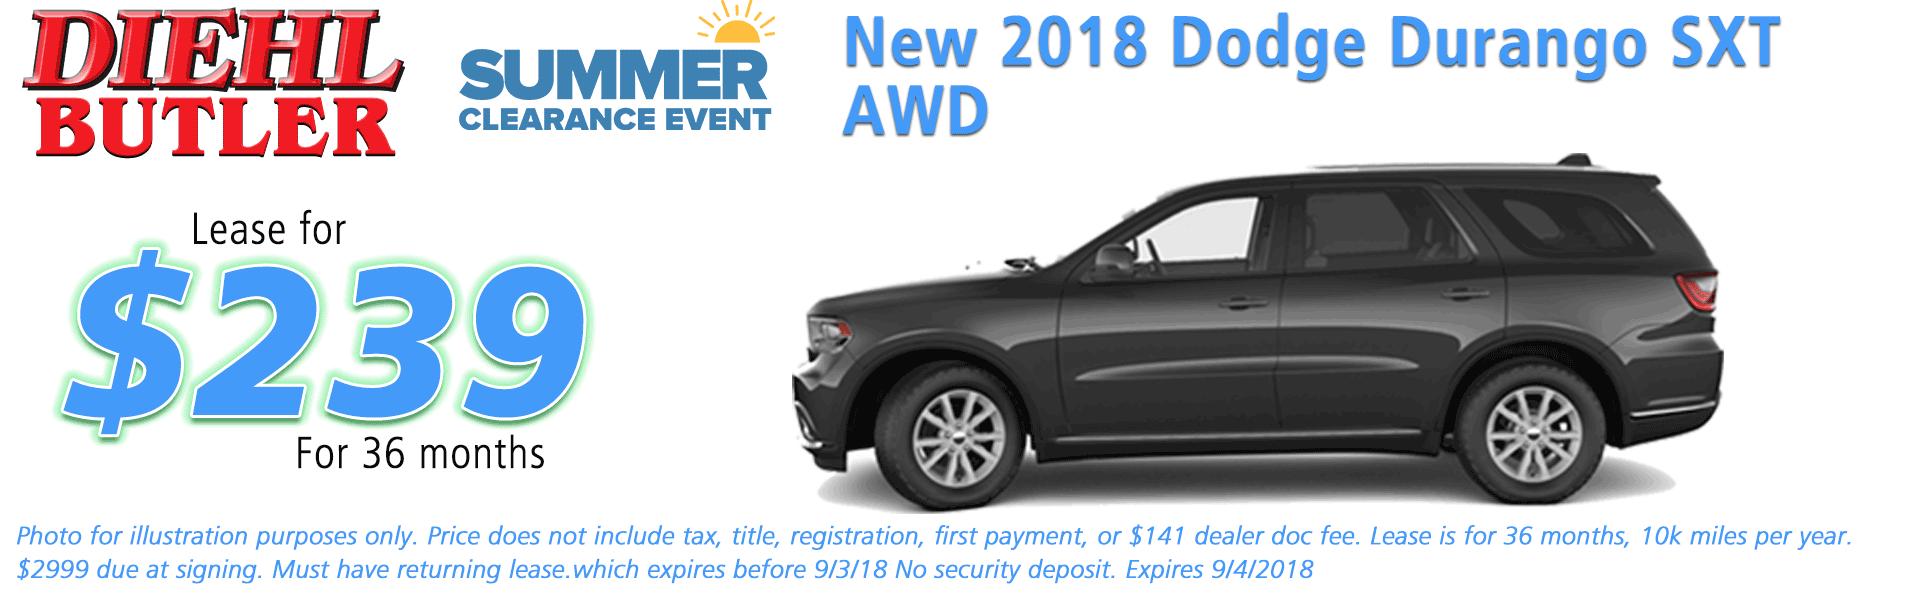 Diehl of Butler, Butler, PA Chrysler Dodge Jeep Ram Toyota Volkswagen service collision sales NEW 2018 DODGE DURANGO SXT PLUS AWD